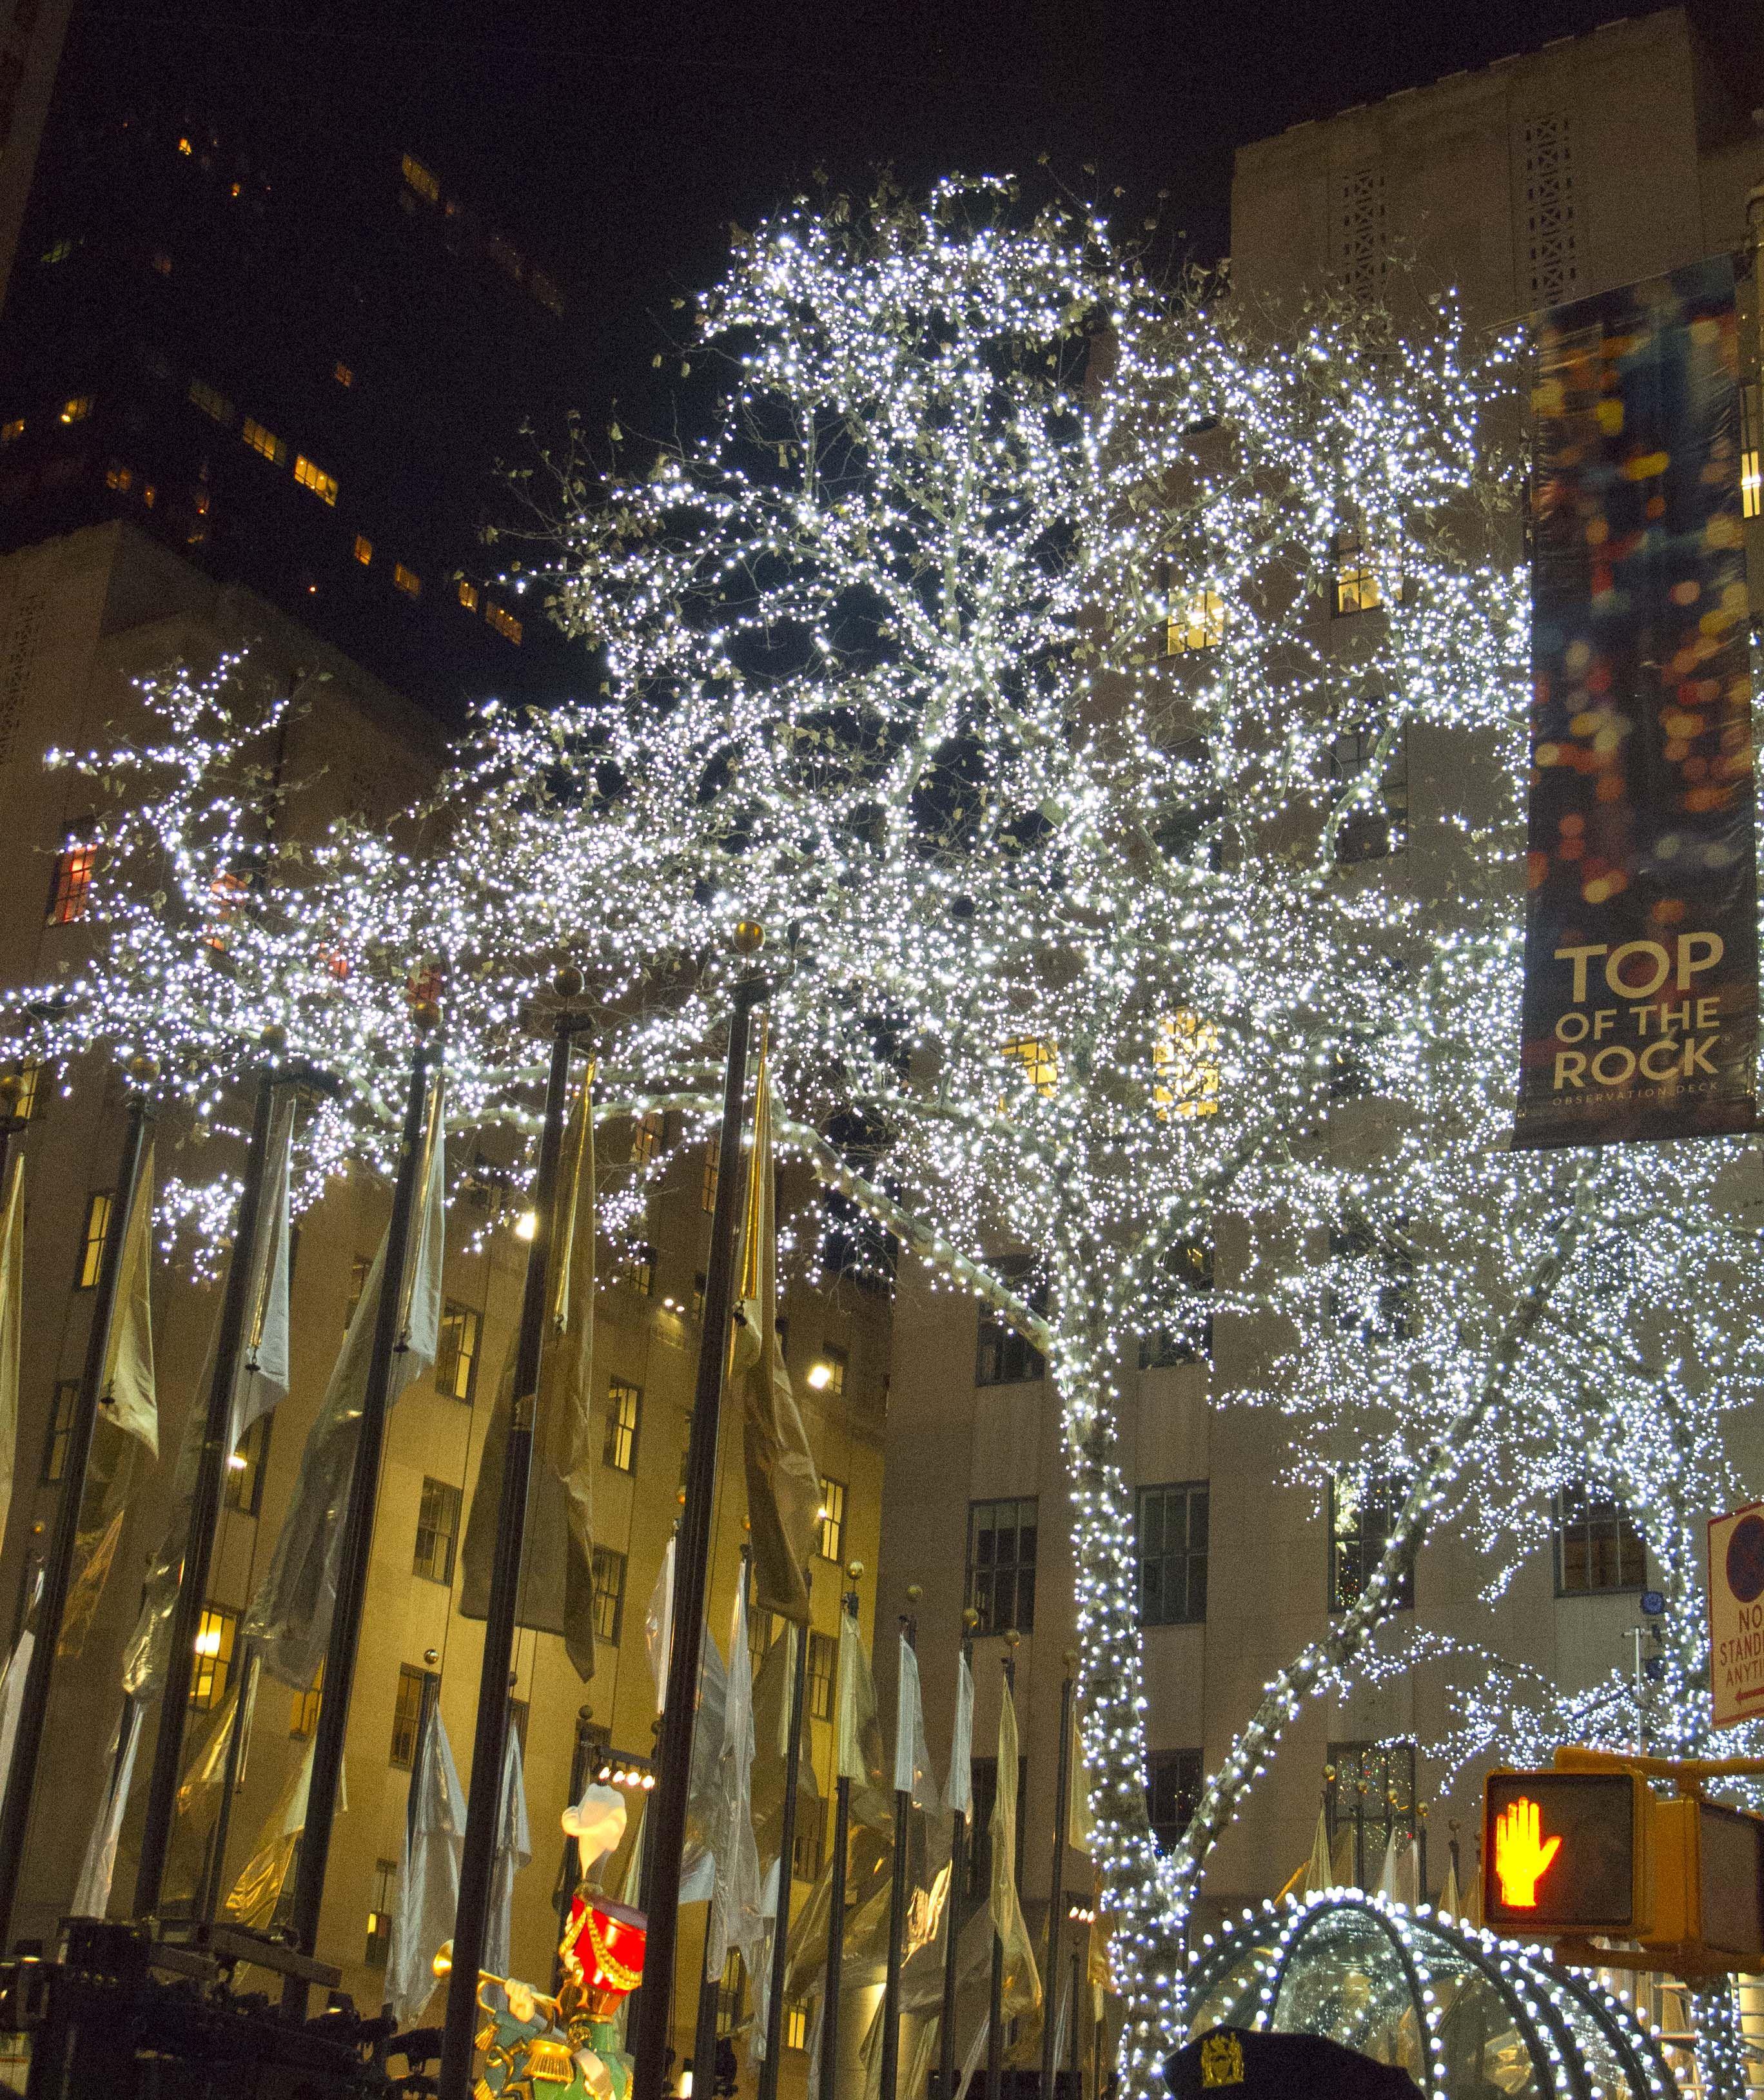 Rockefeller Christmas Tree Lighting 2014: Rockefeller Center Trees With White Holiday Lights. Happy